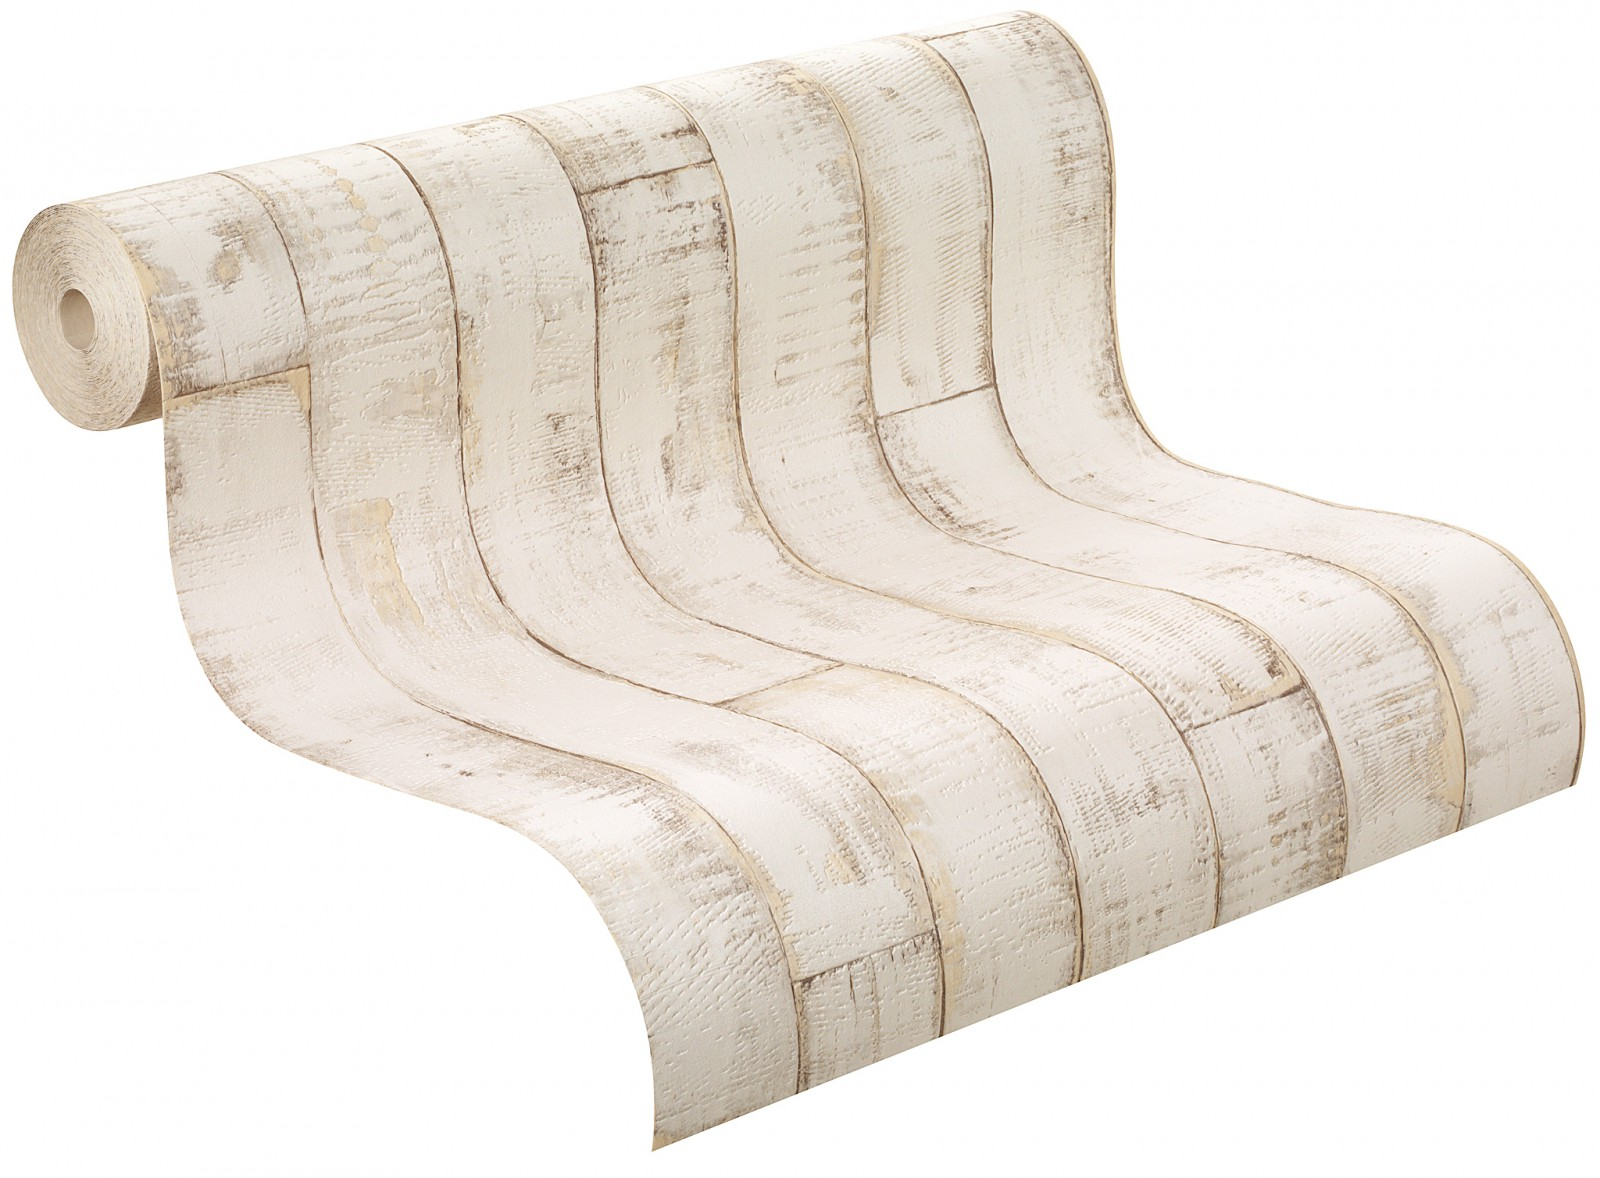 tapete holzoptik weiss beste bildideen zu hause design. Black Bedroom Furniture Sets. Home Design Ideas